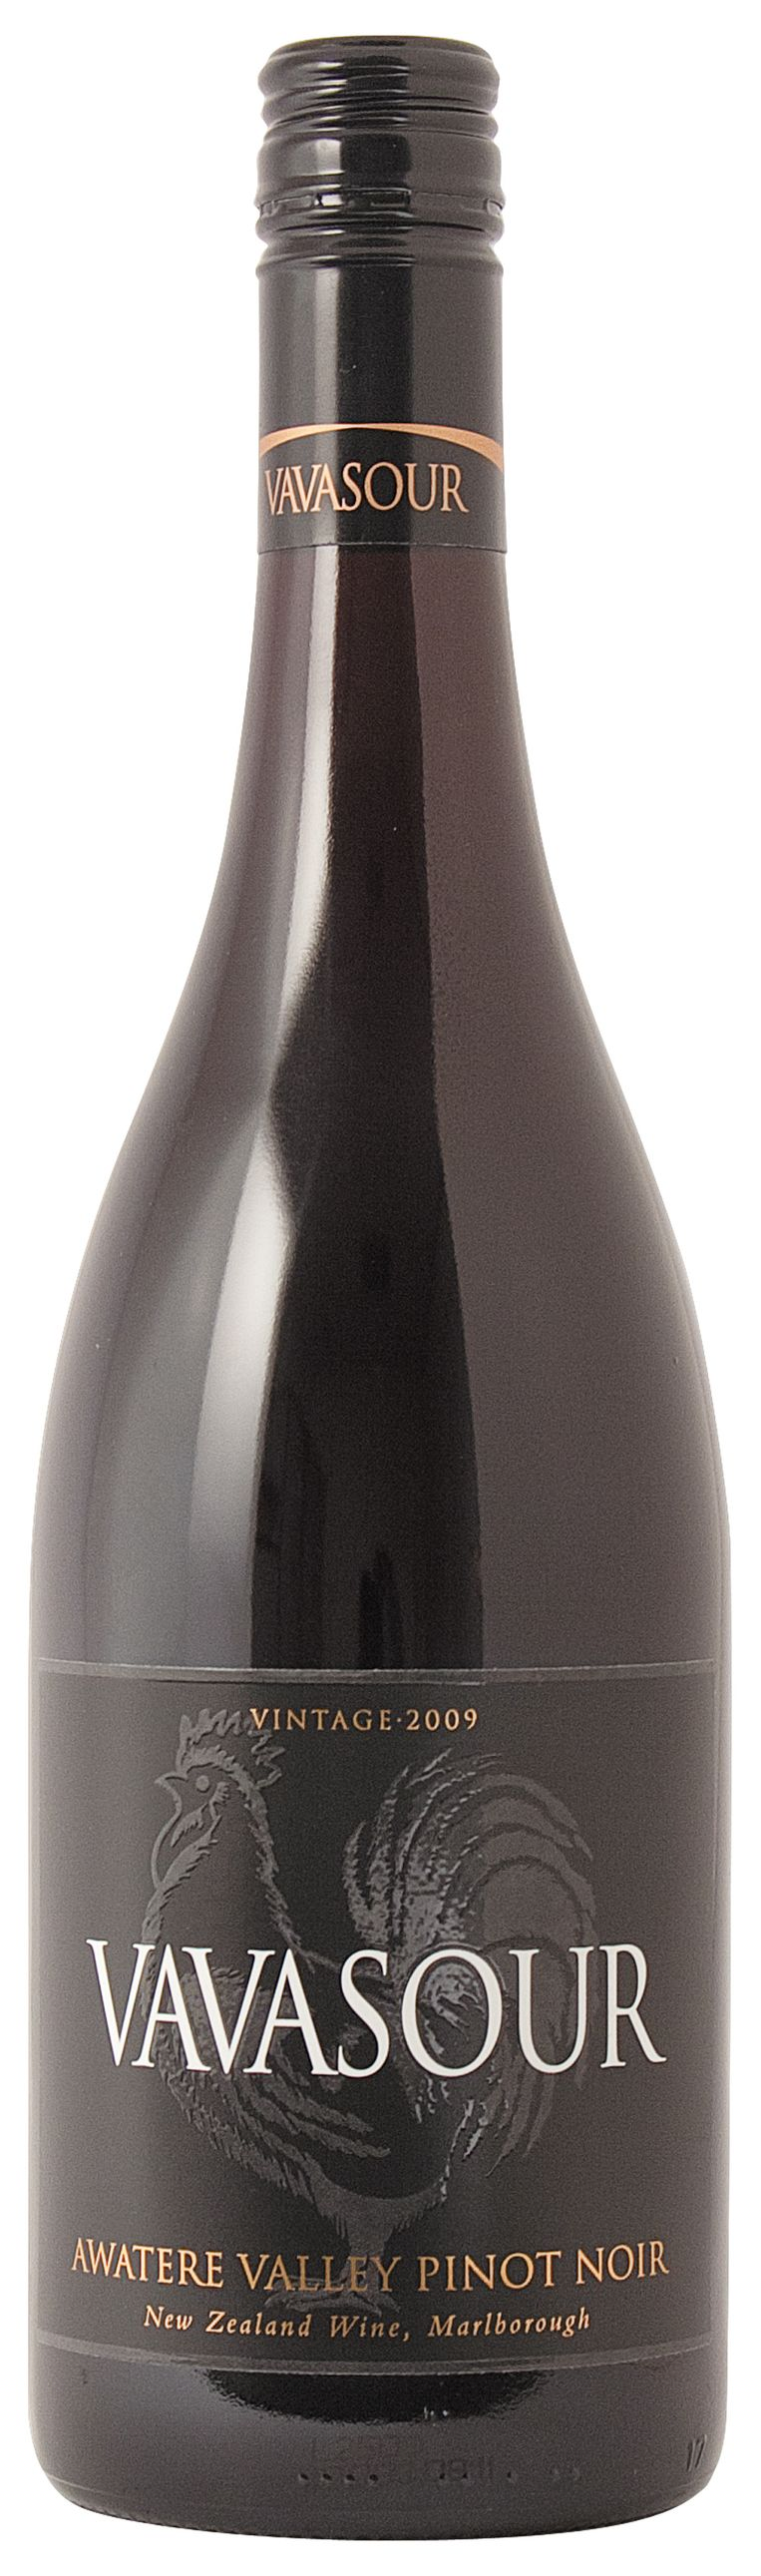 Vavasour Pinot-Noir Beeld Eva Roefs